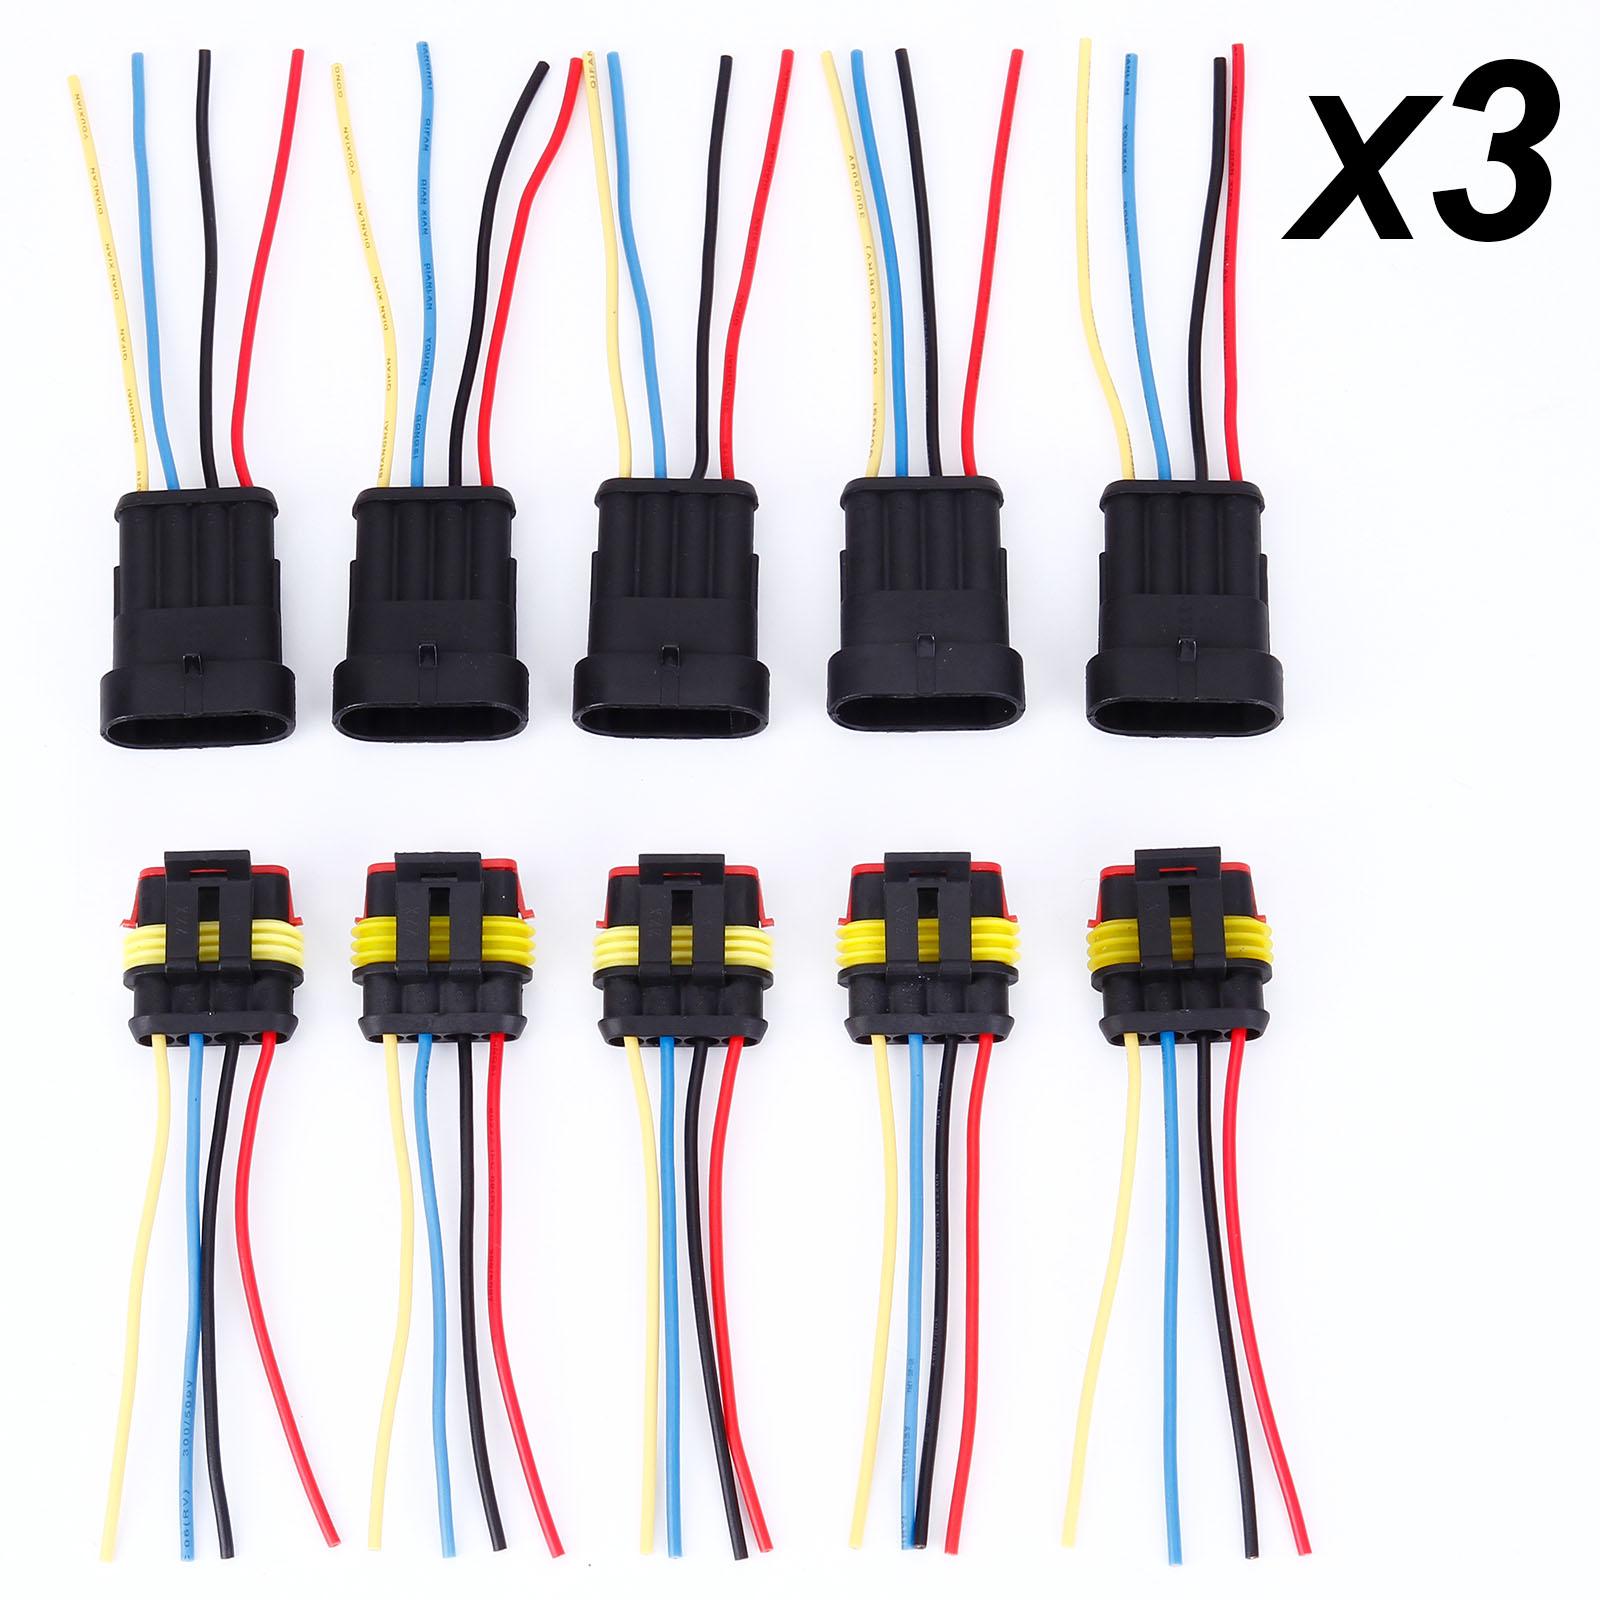 10-30pcs 2/3/4 Pin Way Car Super Seal Waterproof Electrical Wire ...